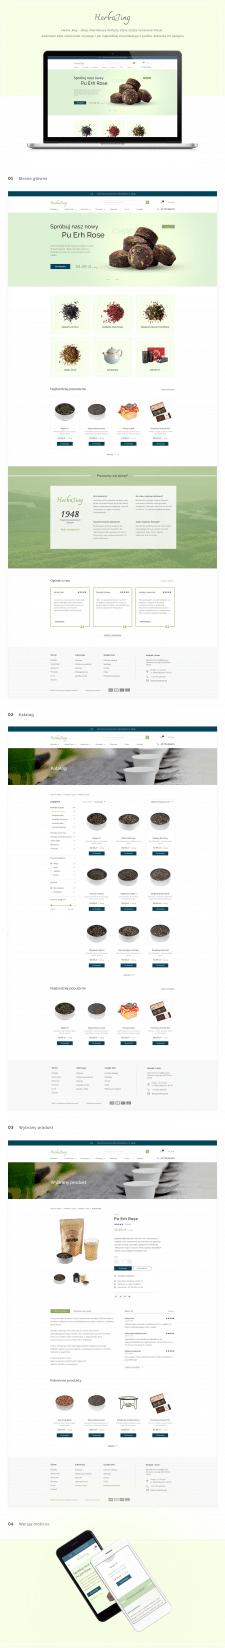 HerbaJing - онлайн-магазин чая